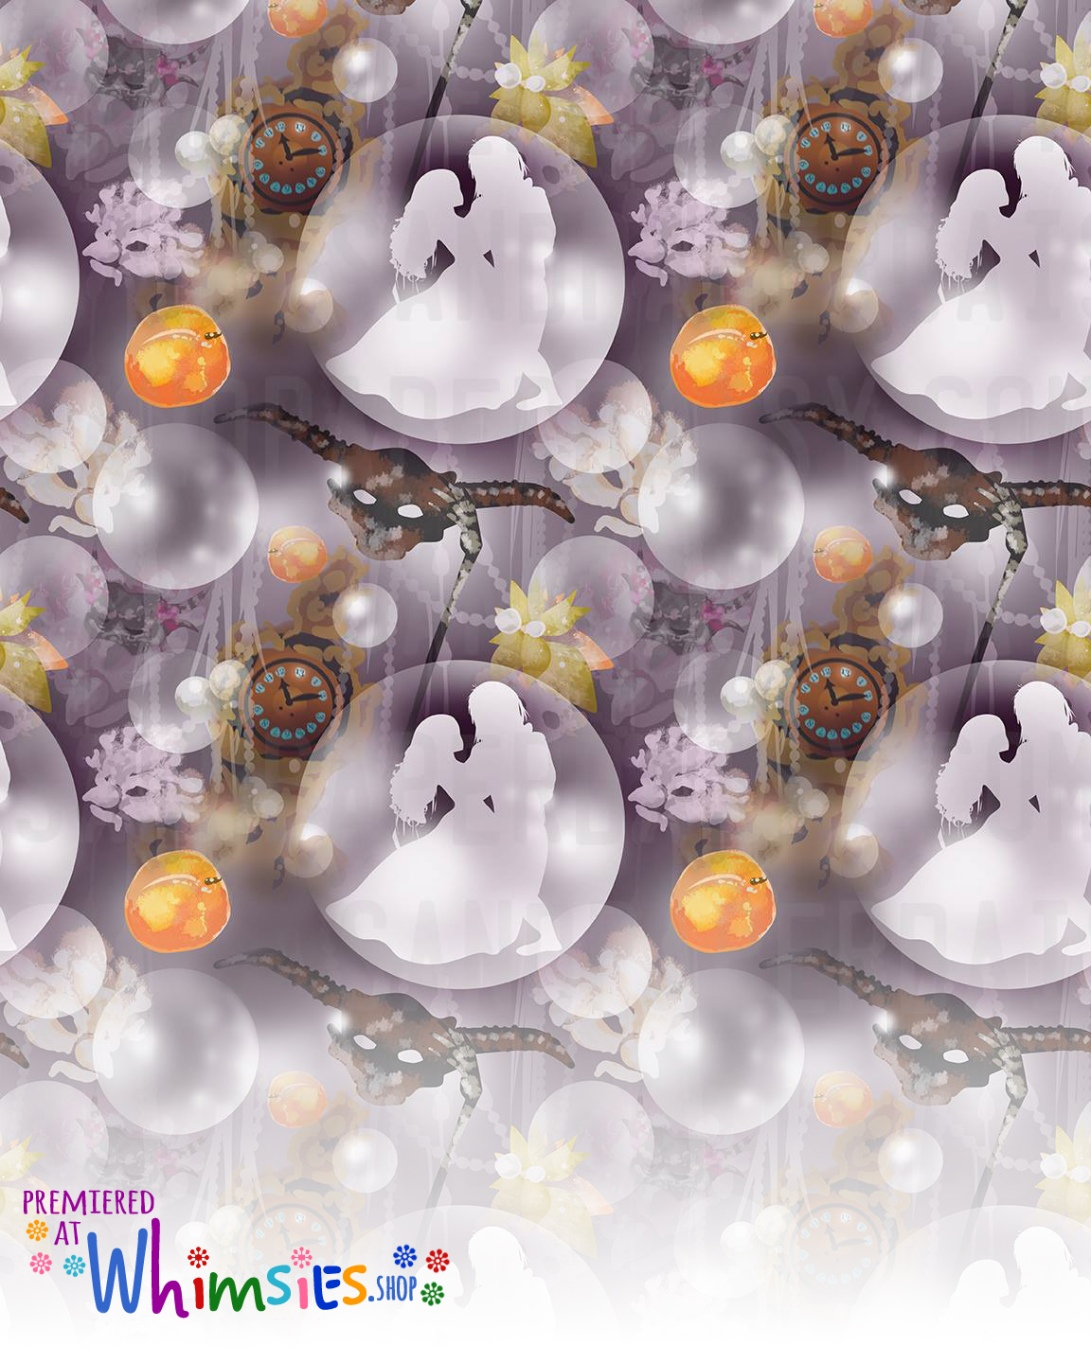 Labyrinth-Ballroom_pattern_sandpaperdaisy